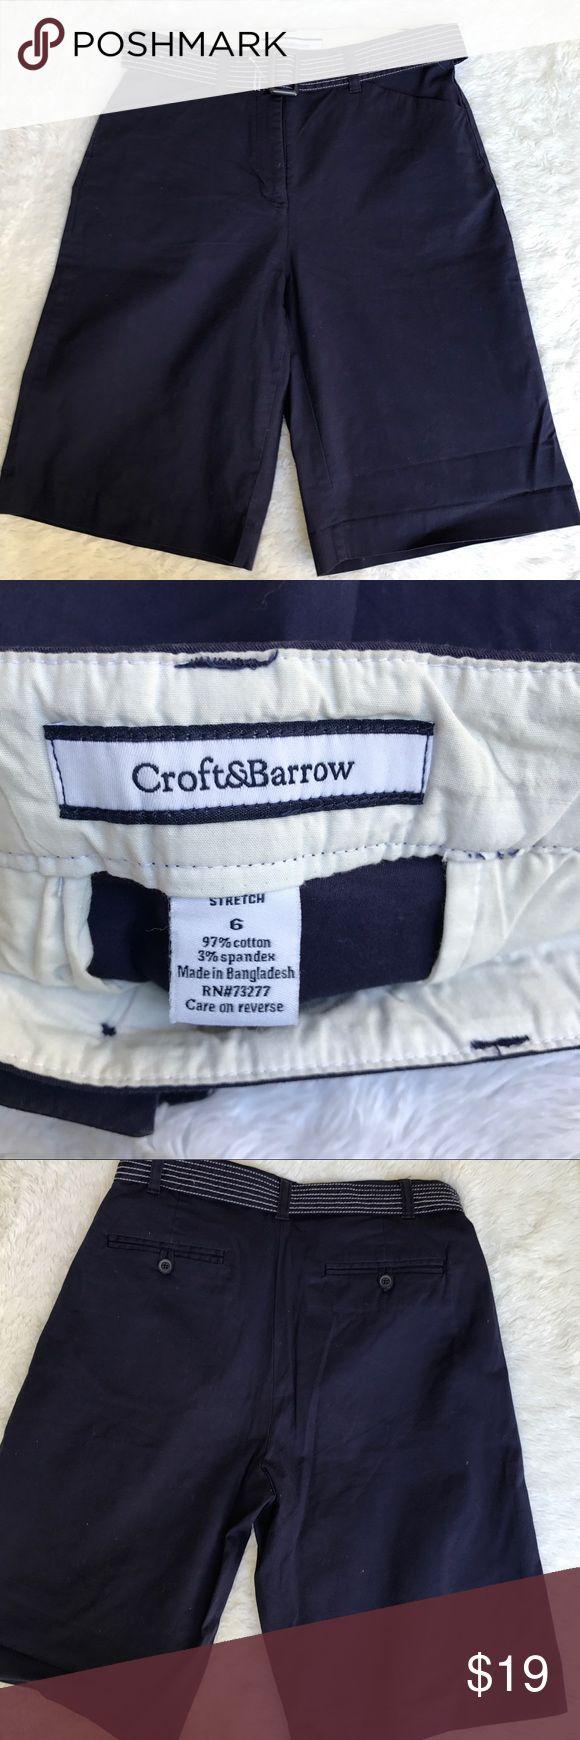 "Croft & Barrow Women's blue shorts. NWOT Croft&Barrow women's blue dress/casual shorts. 2 deep front pockets 2 back pockets. Belt comes with shorts. Size 6 stretch inseam 11.5 rise 11"" waistline laying flat 14.5"" bin 11 croft & barrow Shorts"